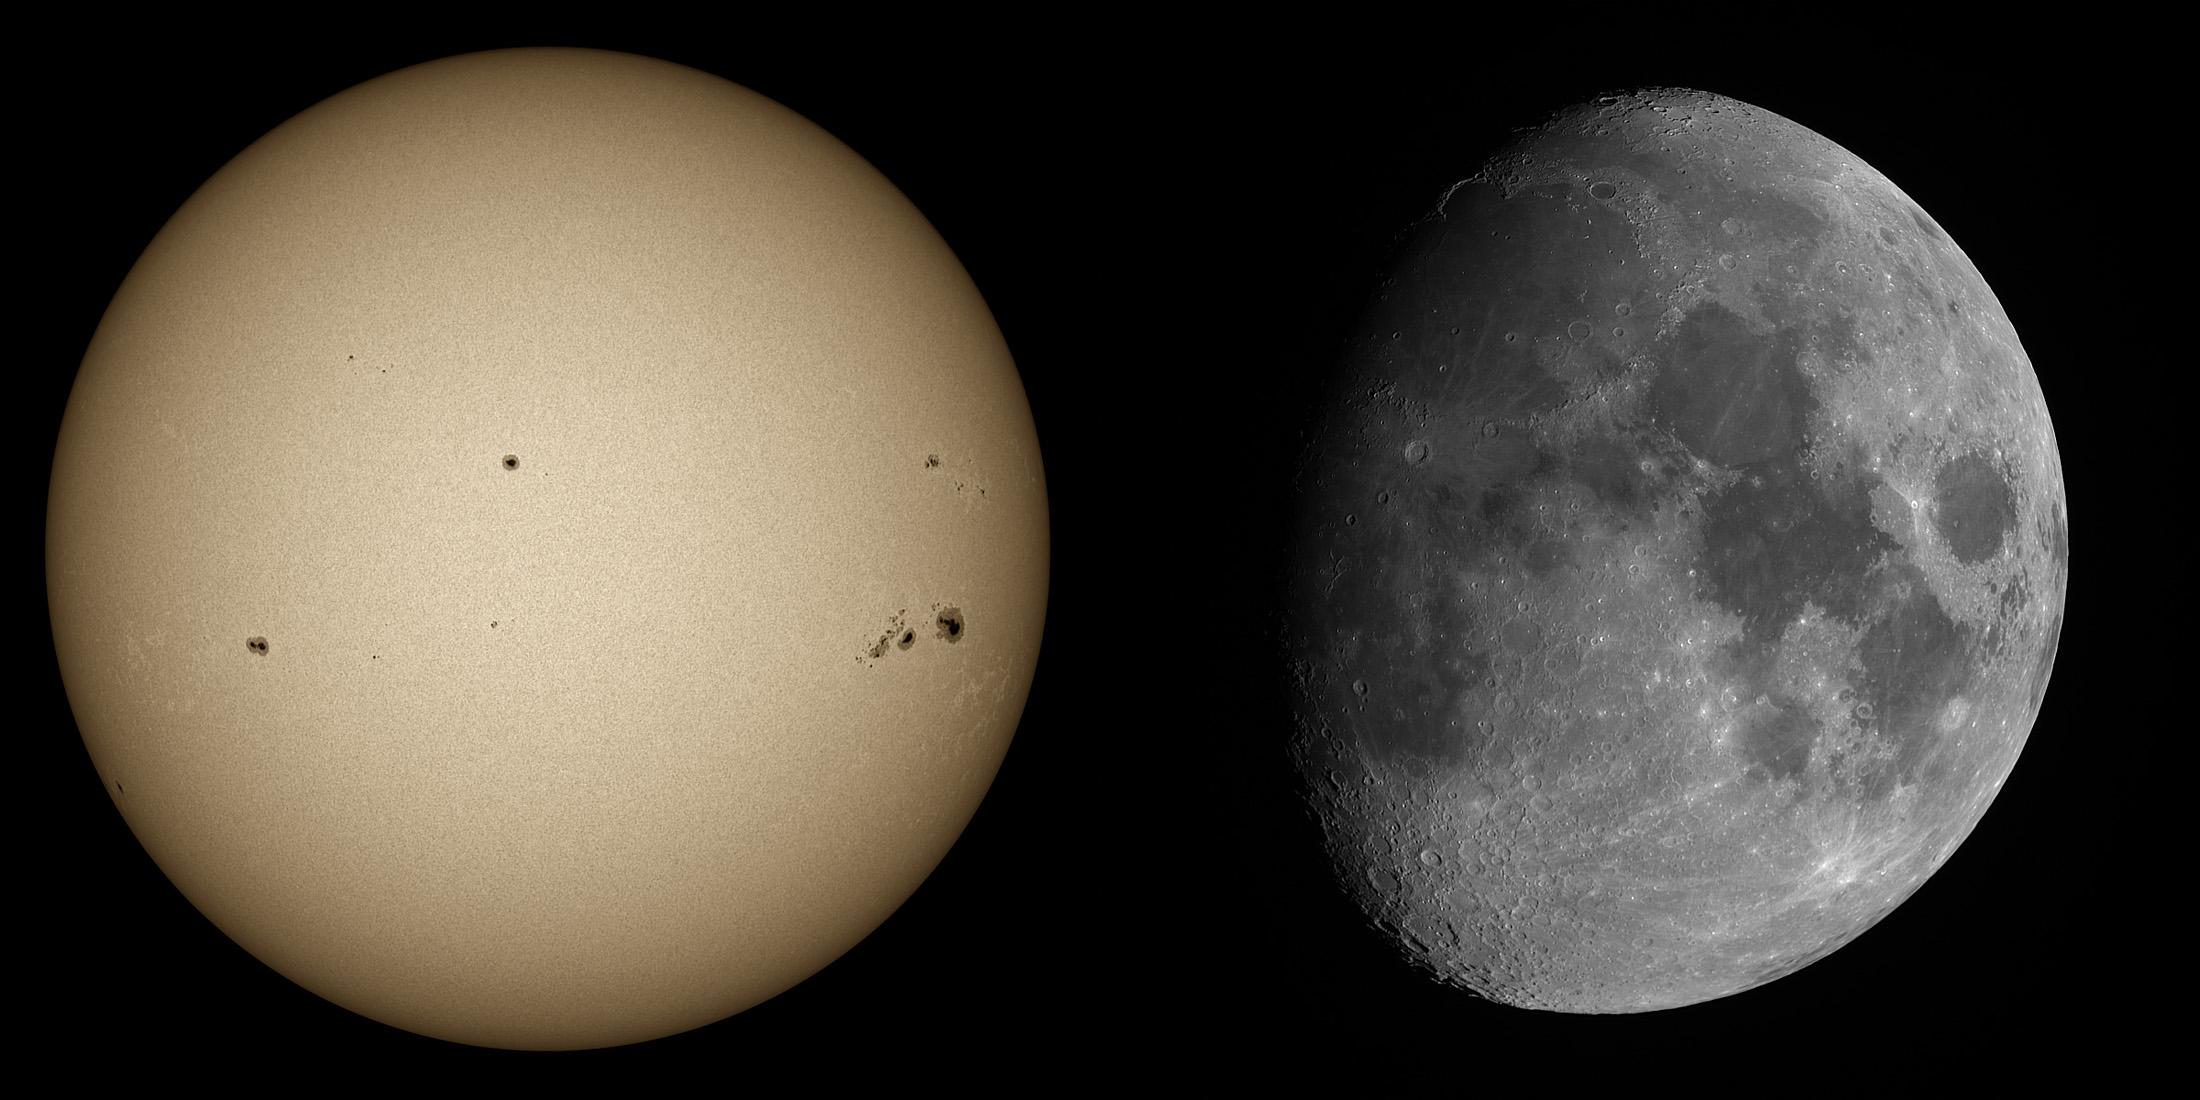 14-sun_moon_TV101_20140111_G3_mosaic